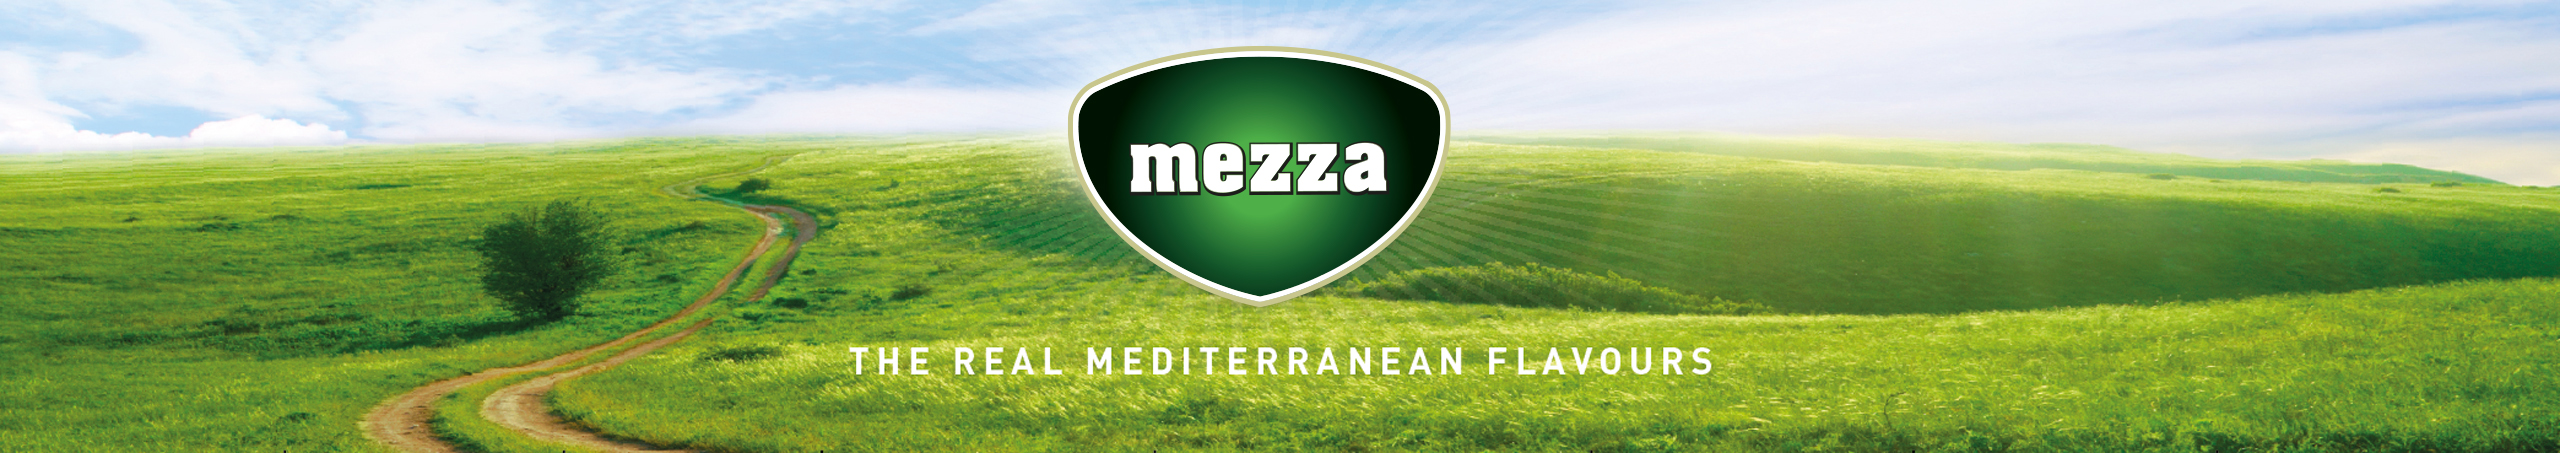 Mezza food